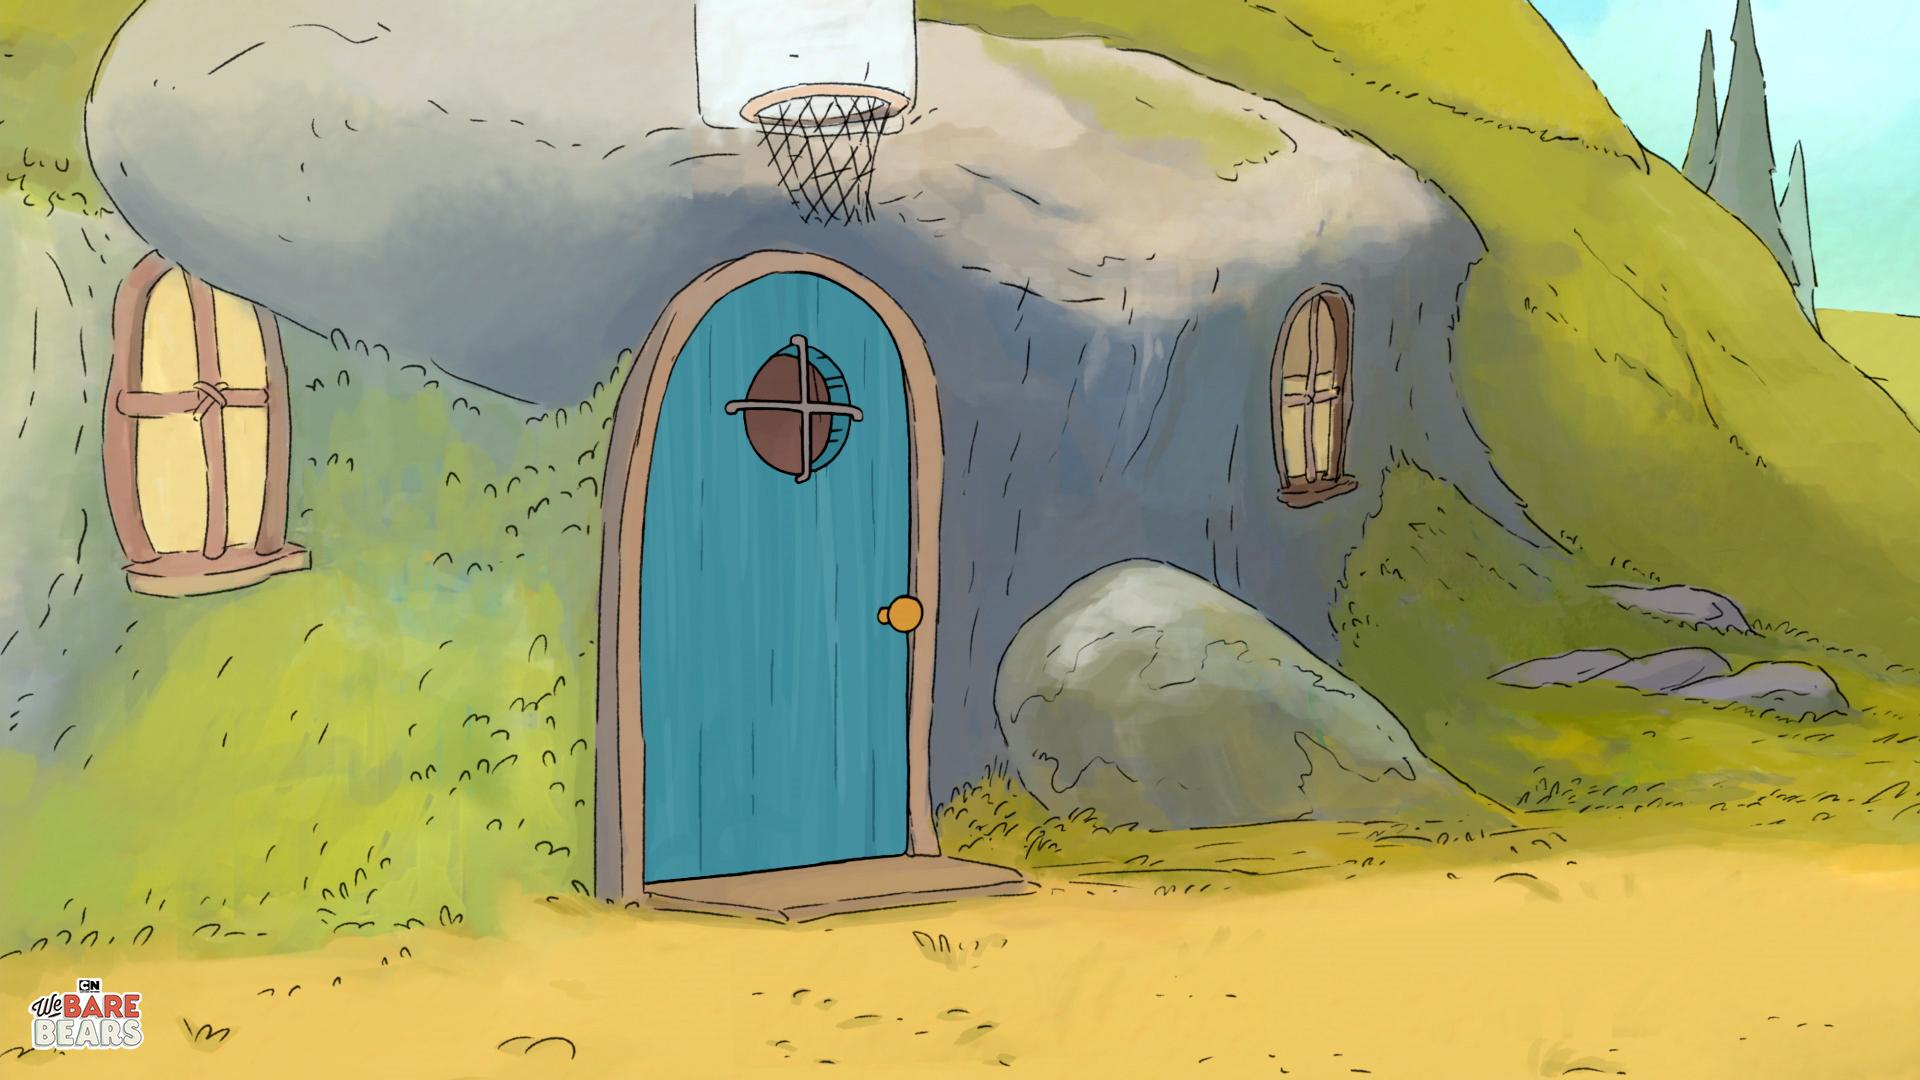 Wallpaper Cartoon Network Cartoon We Bare Bears 1920x1080